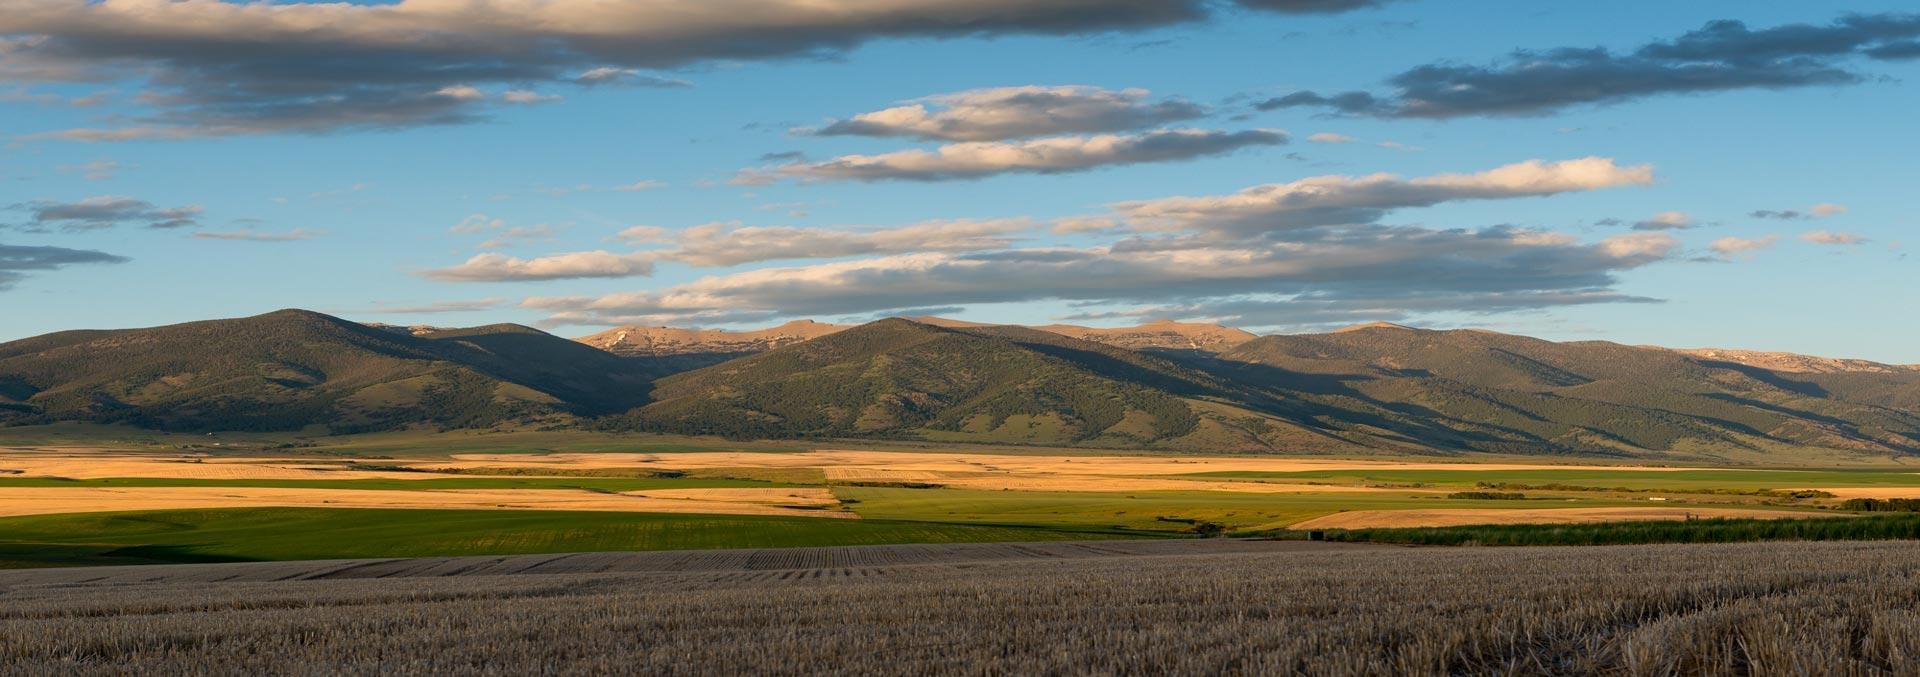 montana ranch for sale dry creek farm